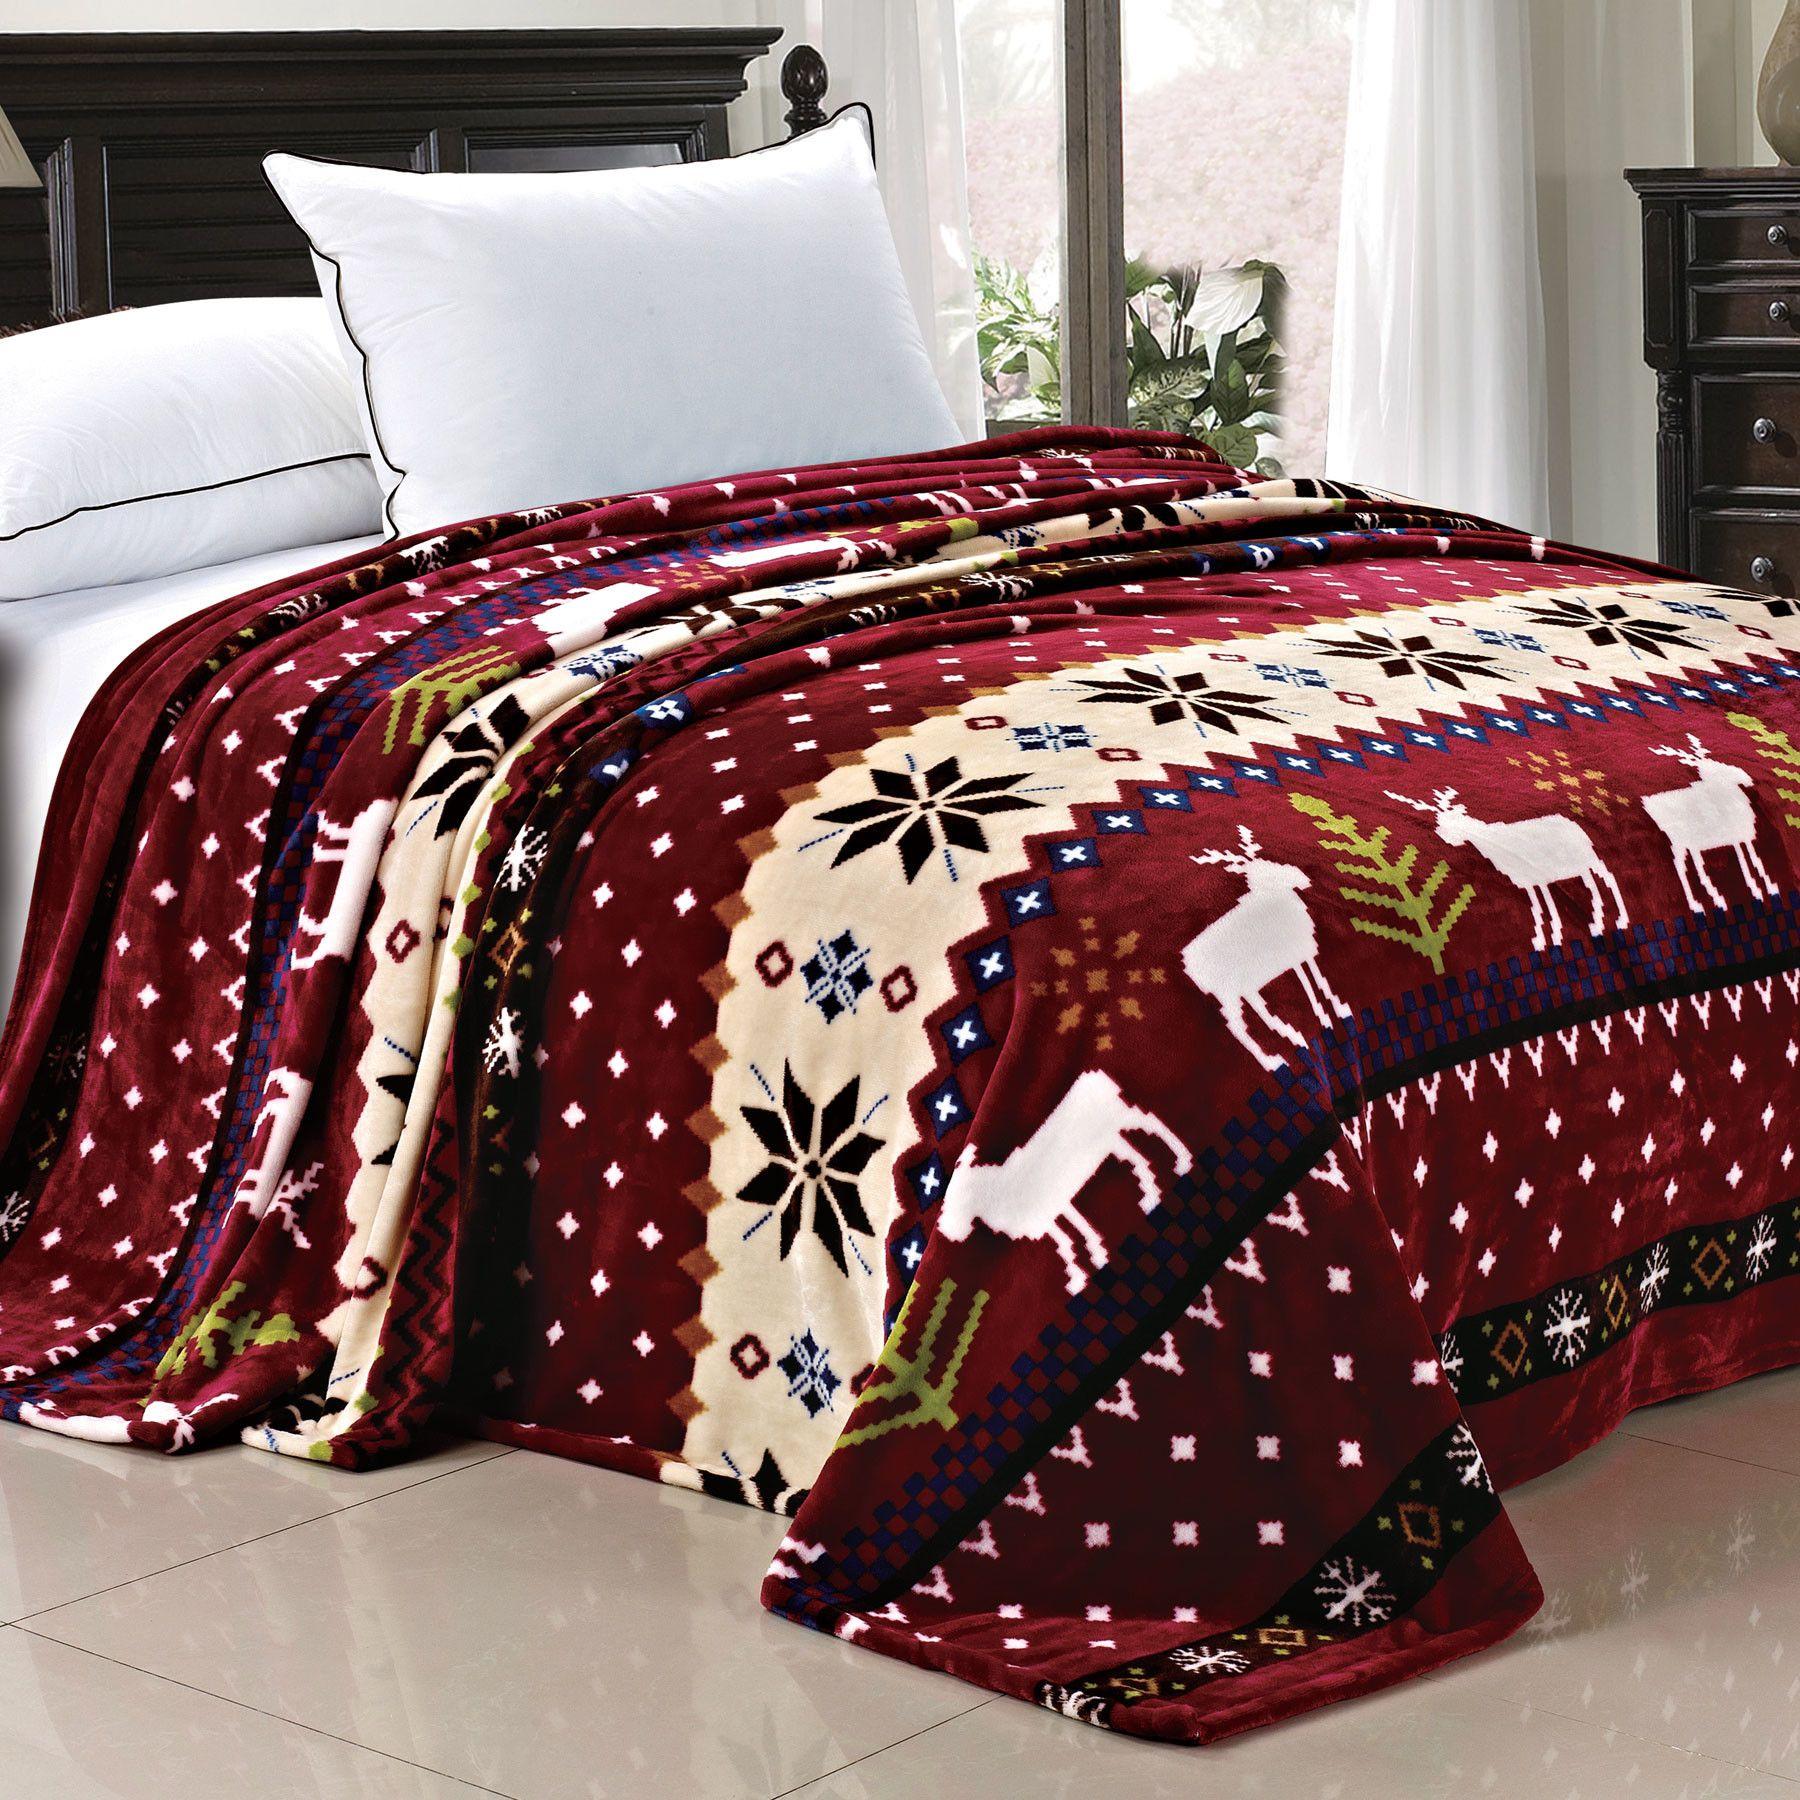 Christmas Snowflake Deer Fleece Throw Blanket